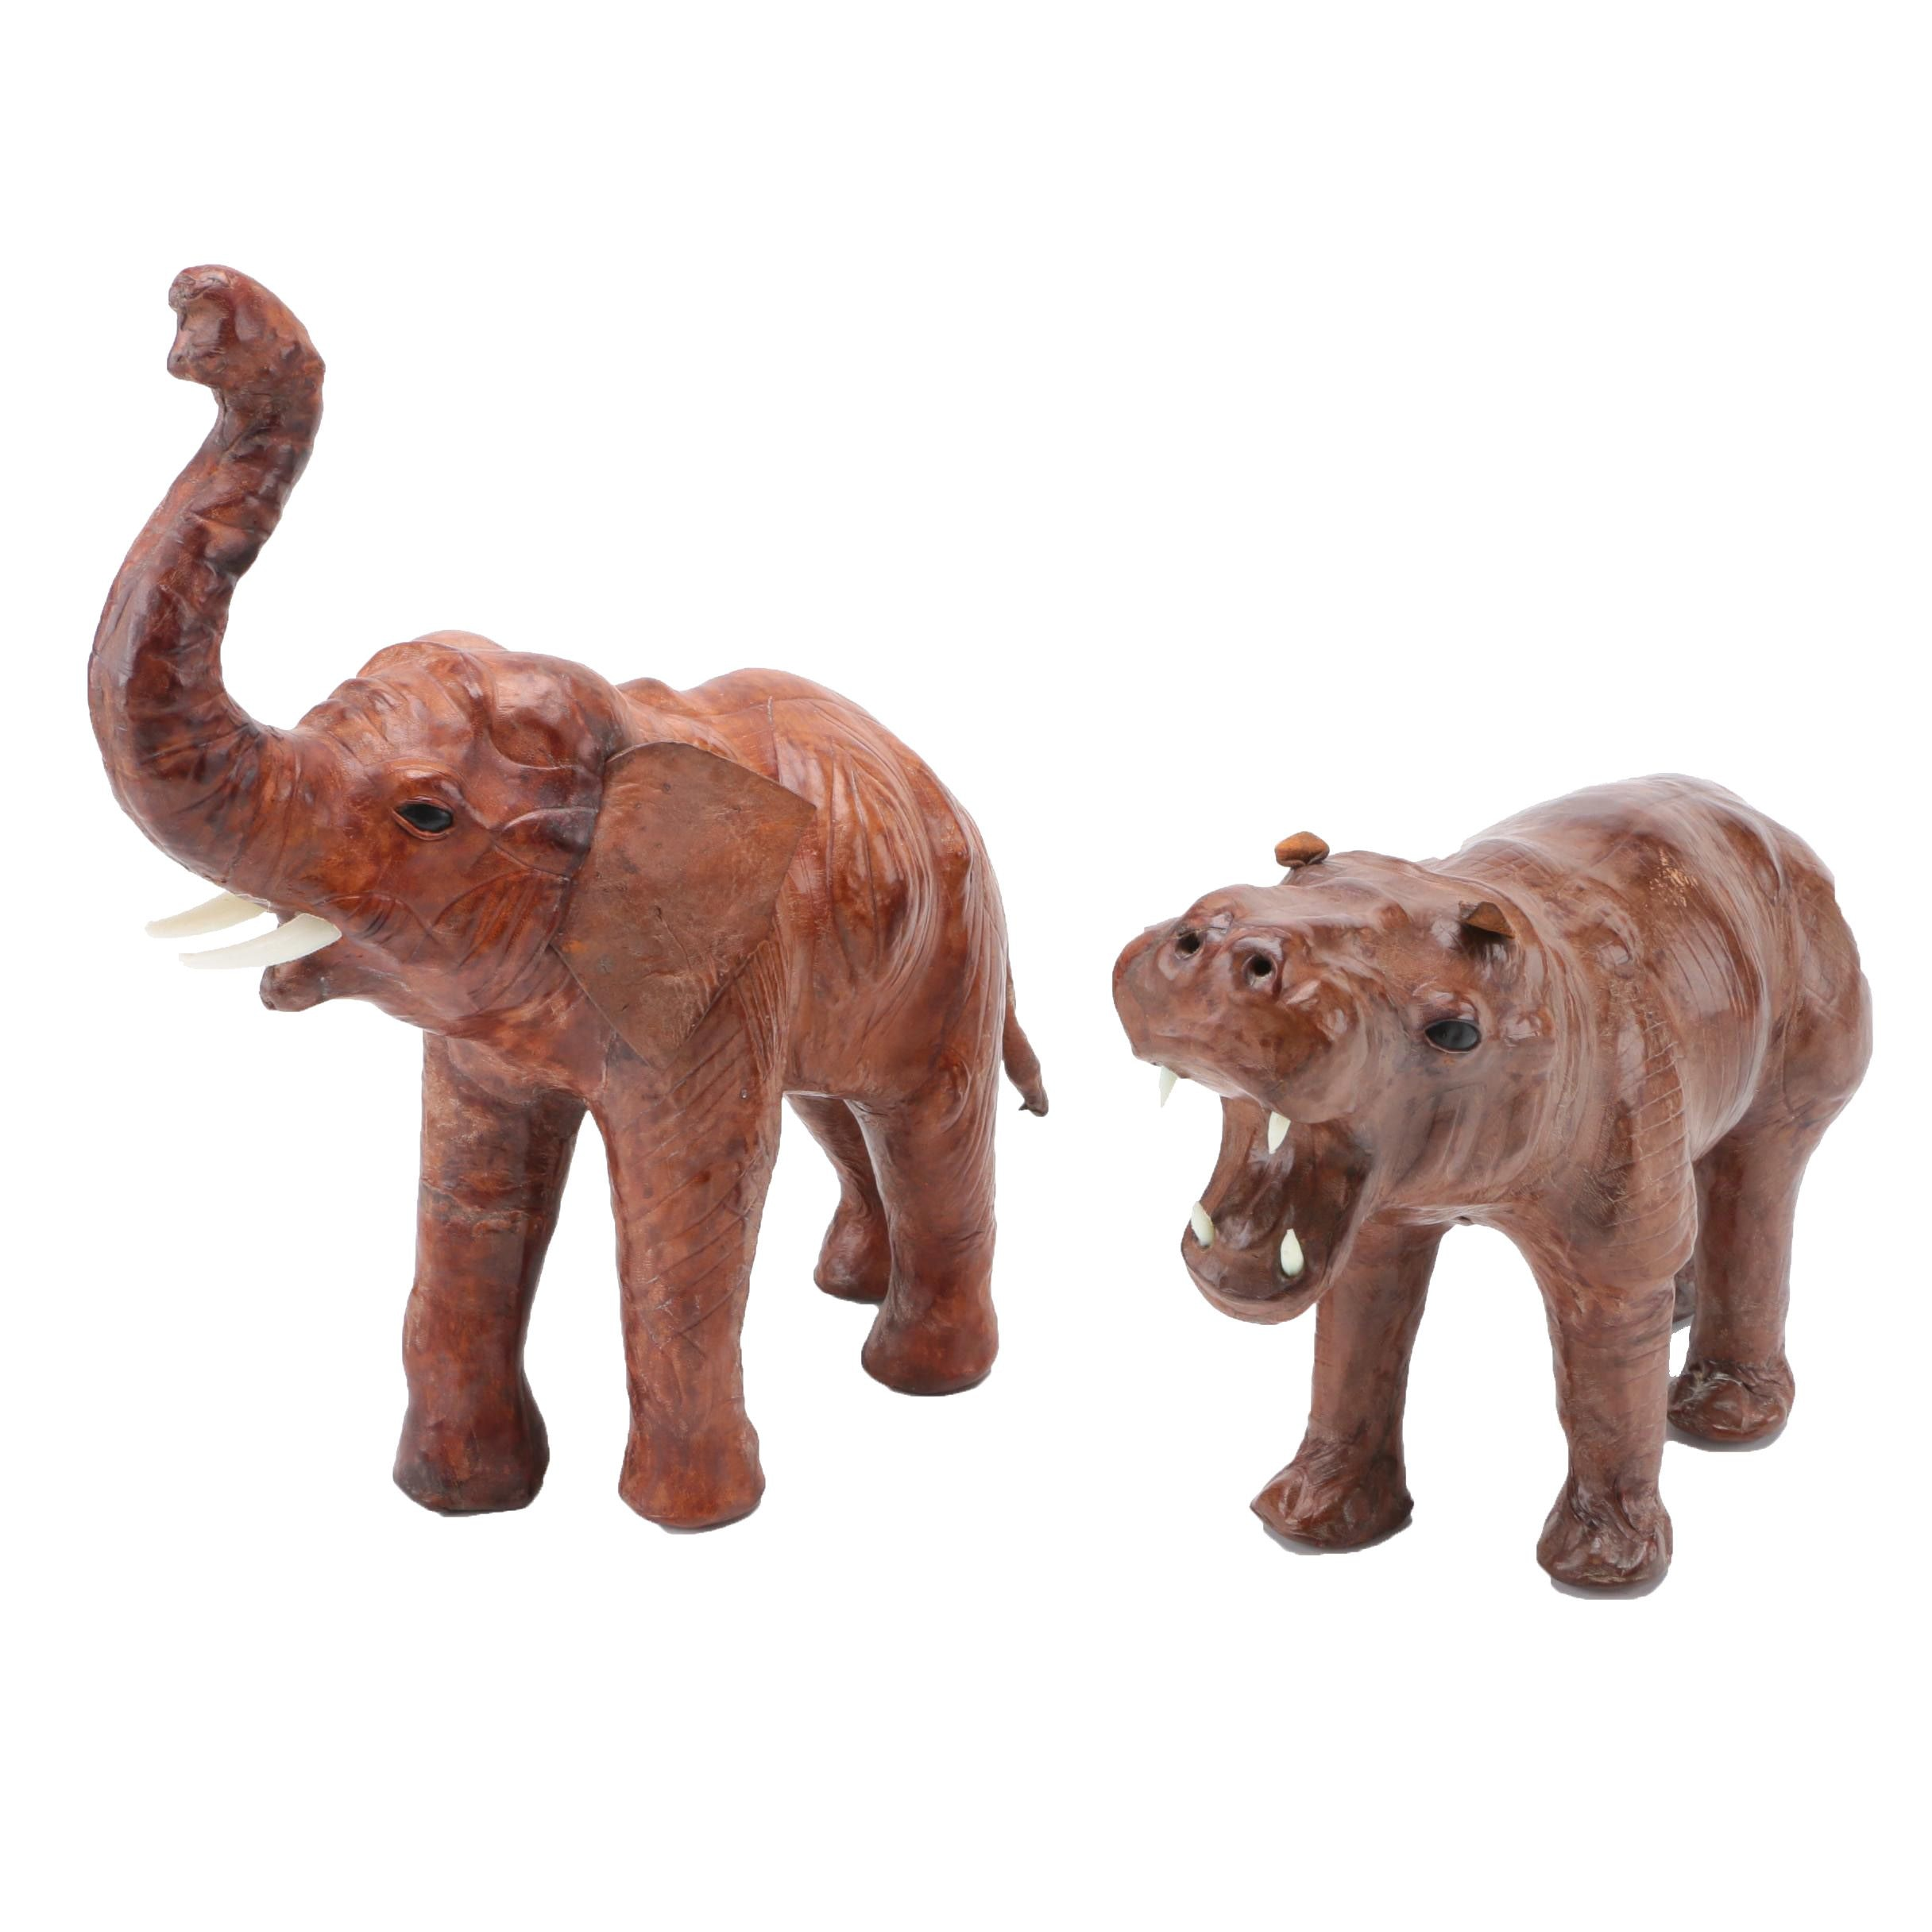 Elephant and hippopotamus wooden figurine